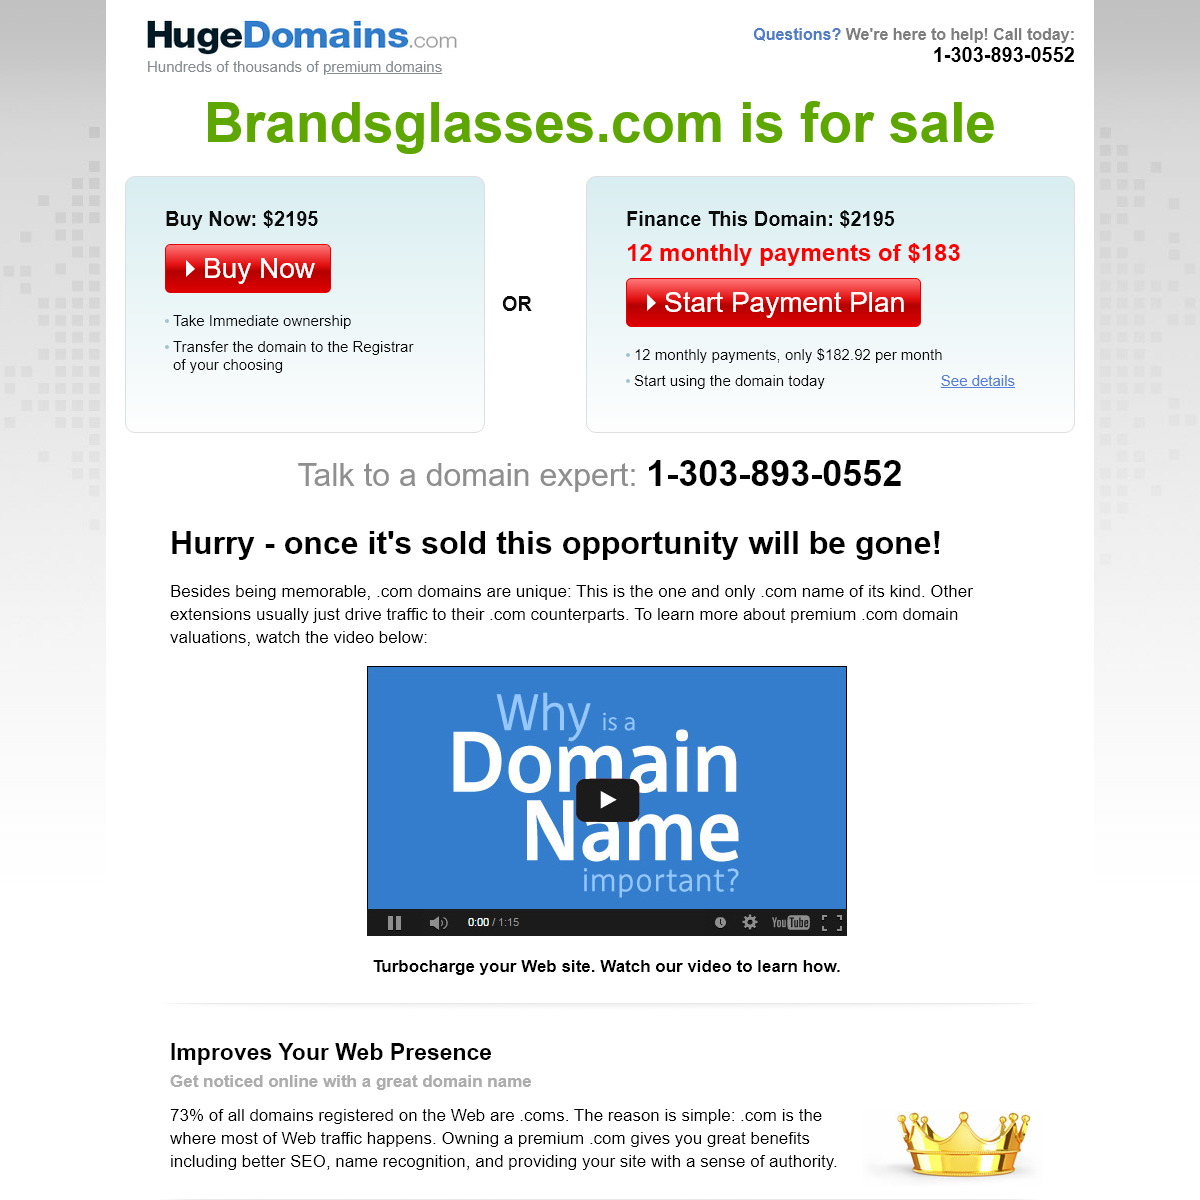 HugeDomains.com - Brandsglasses.com is for sale (Brandsglasses)